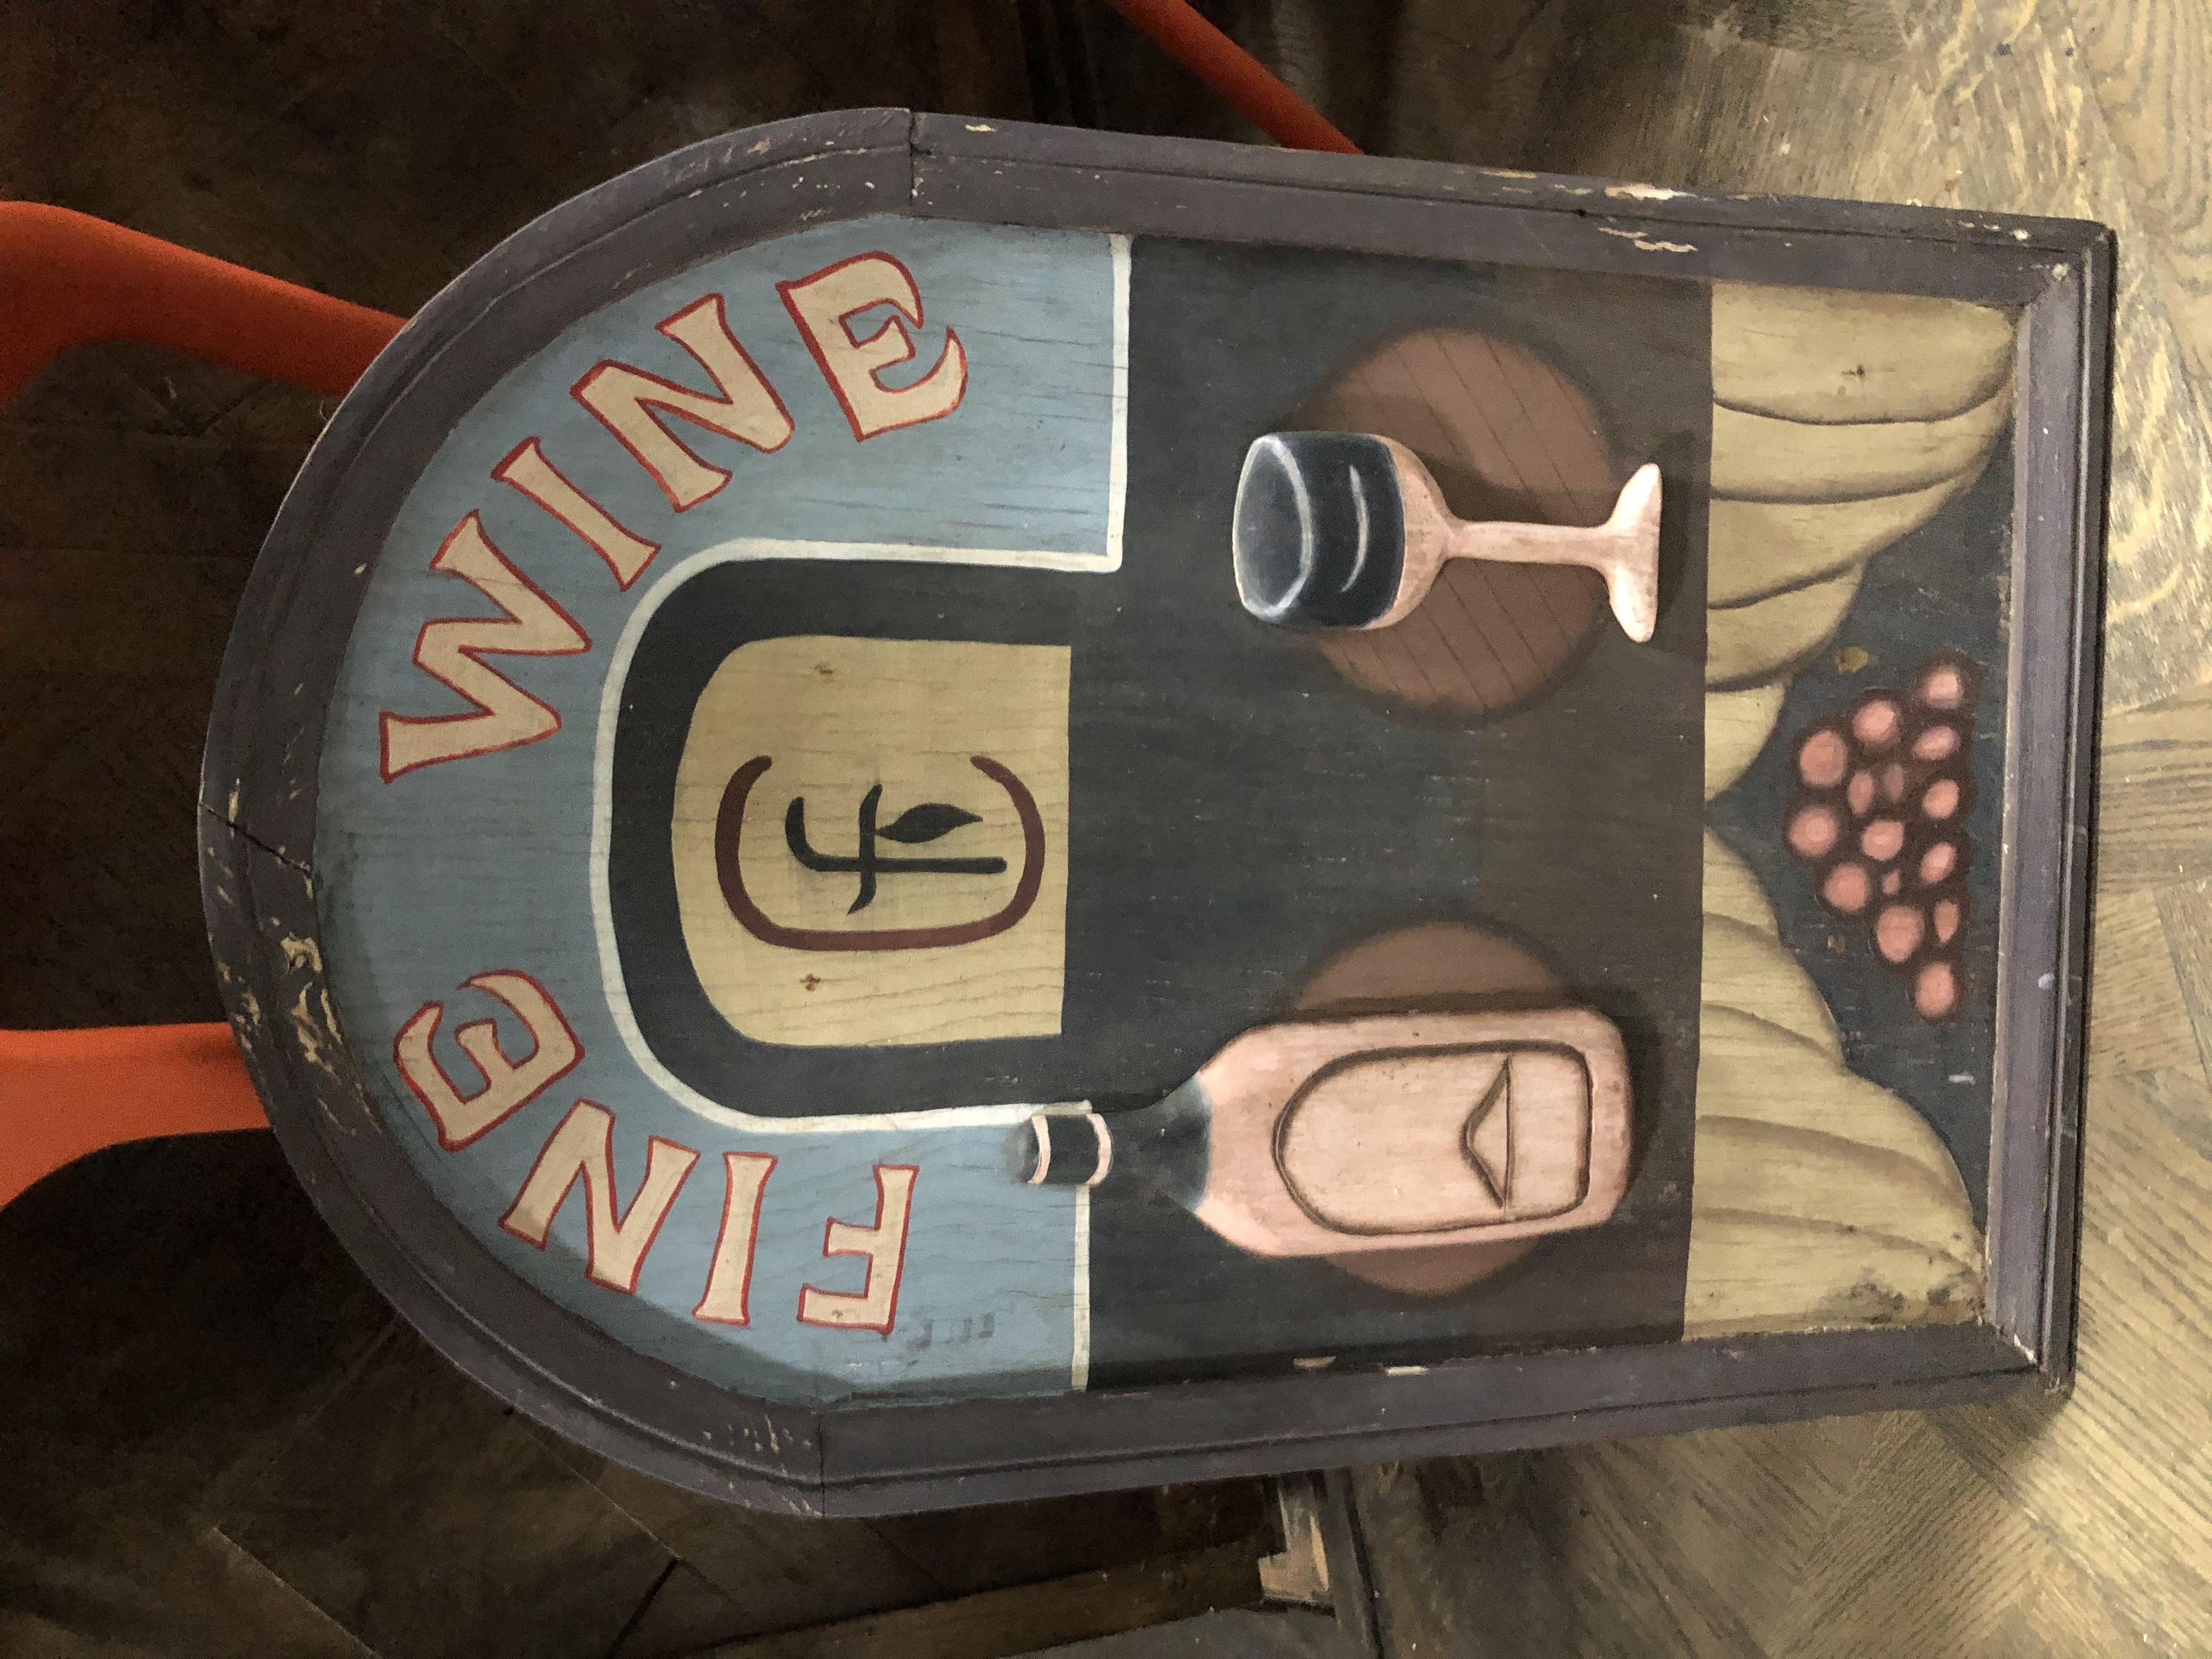 Vintage fine wine artt